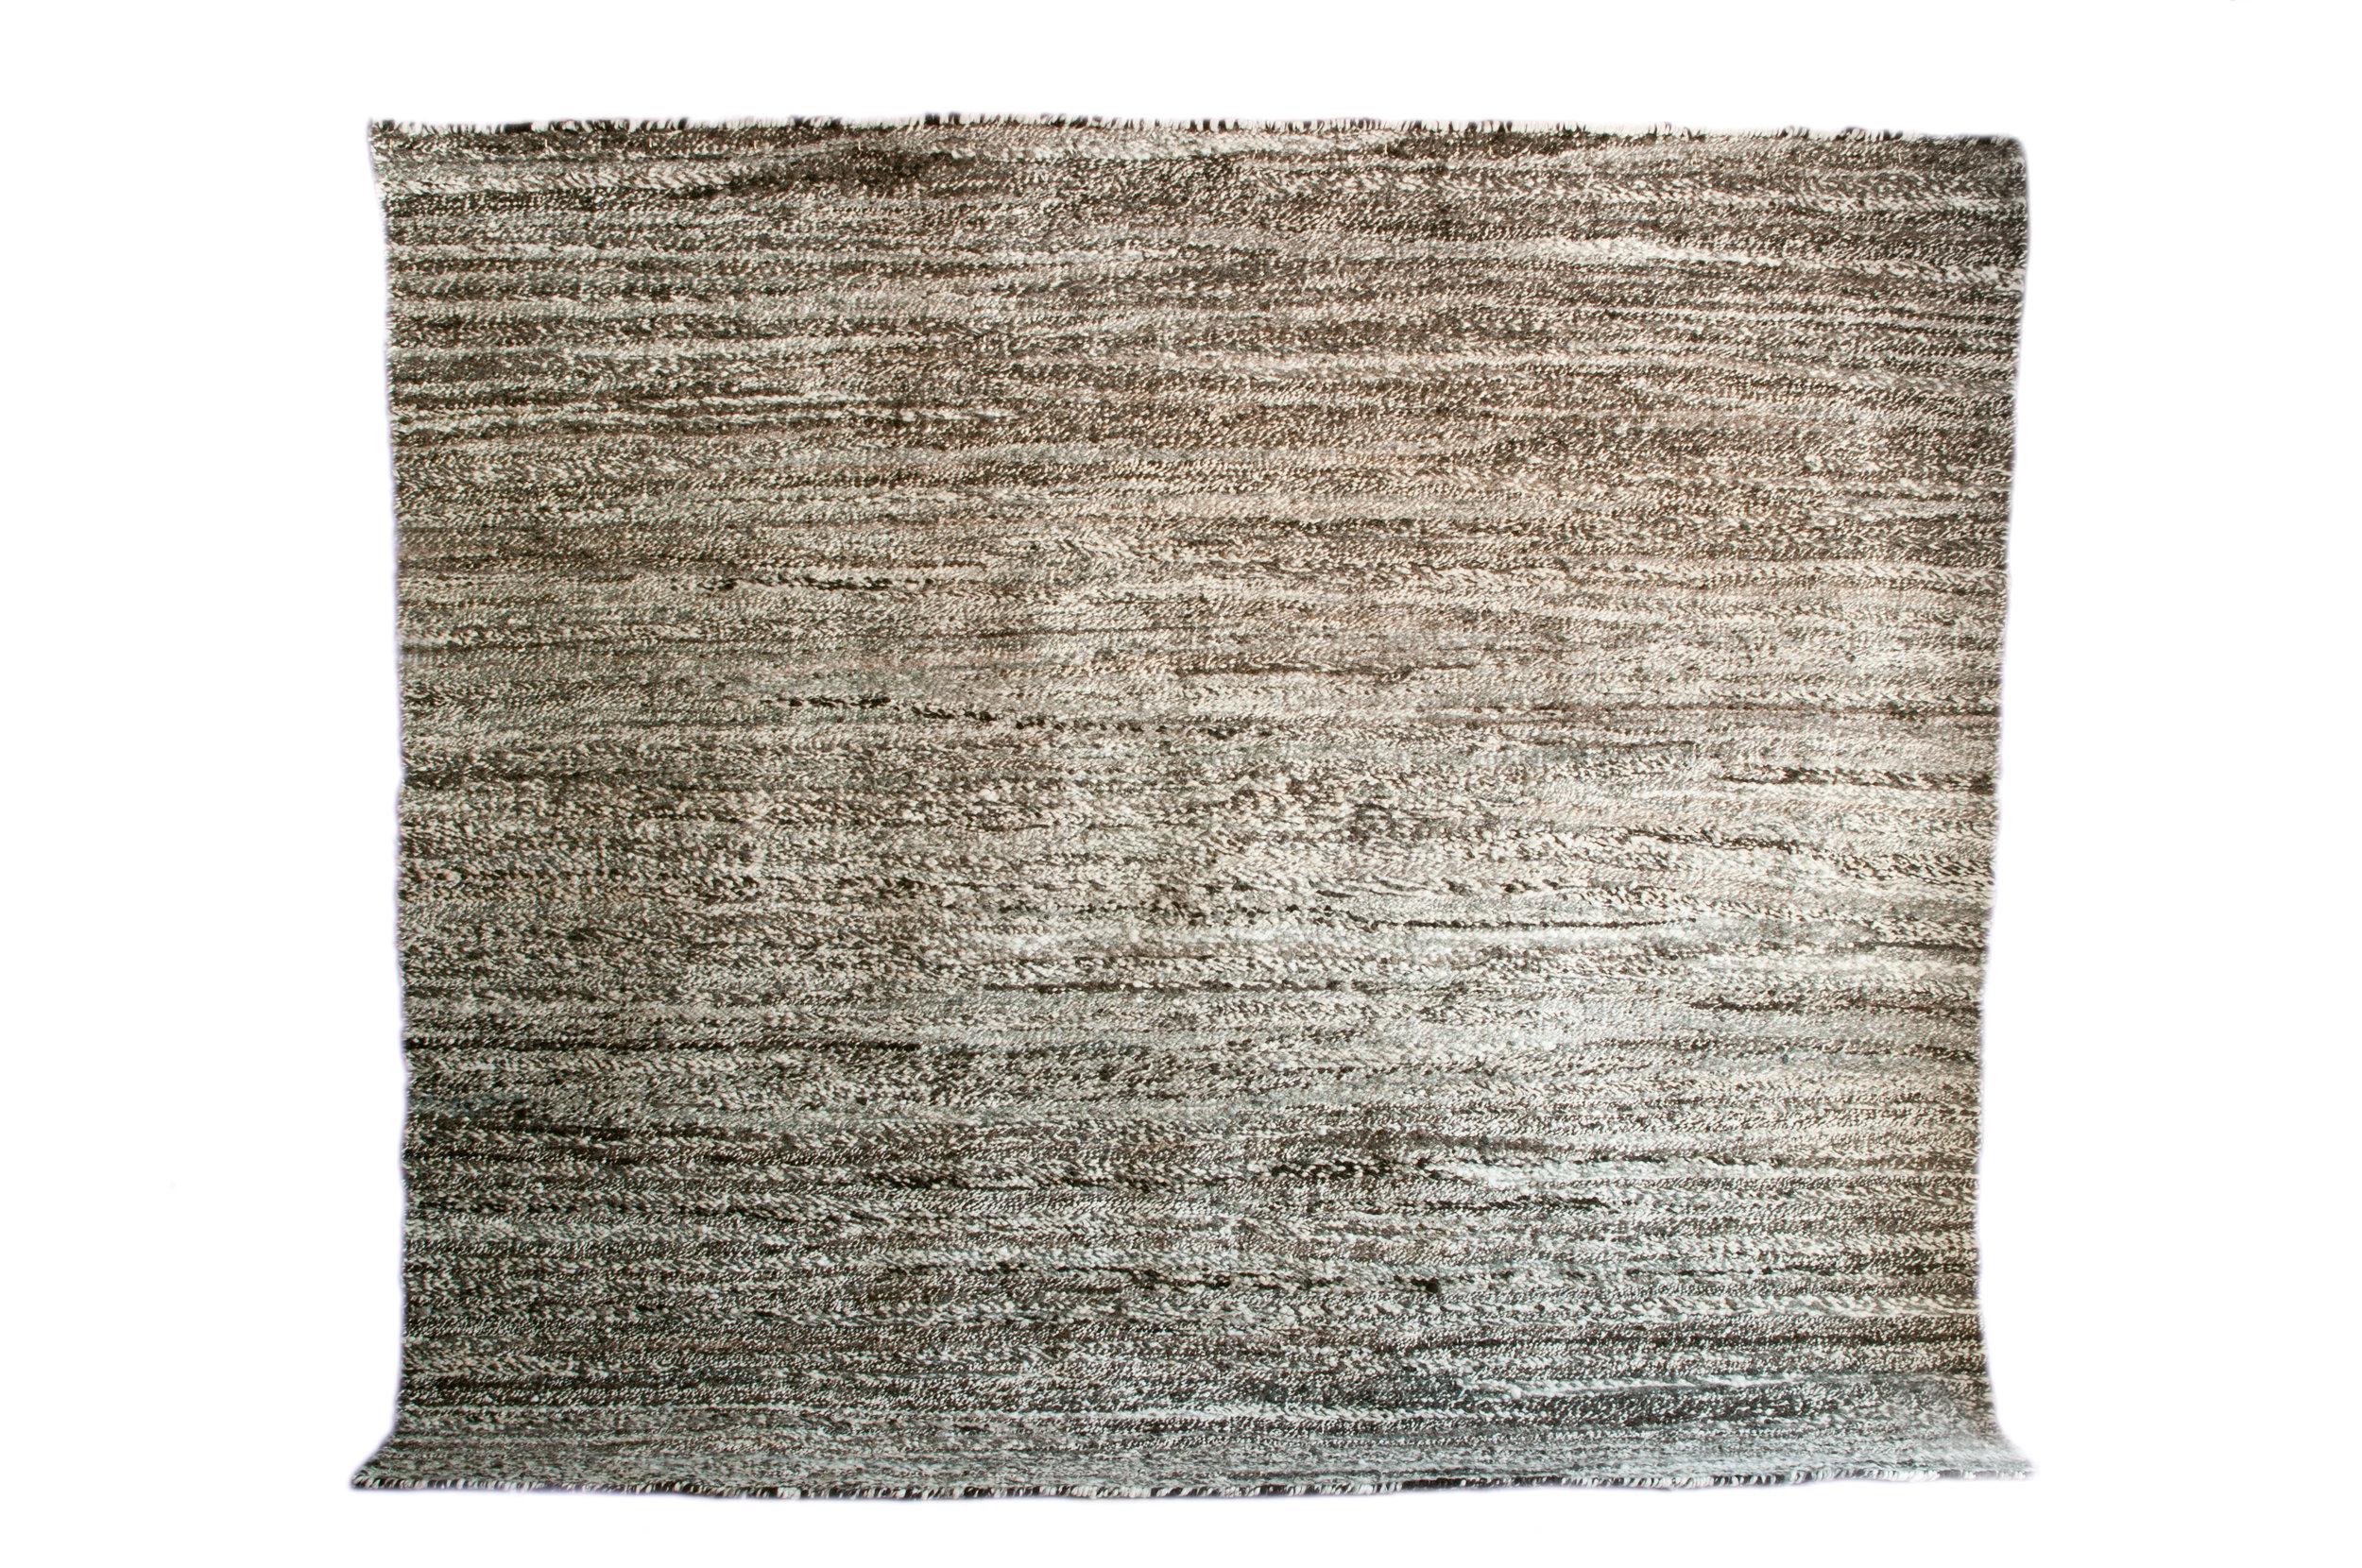 twisted weave karakul.jpg